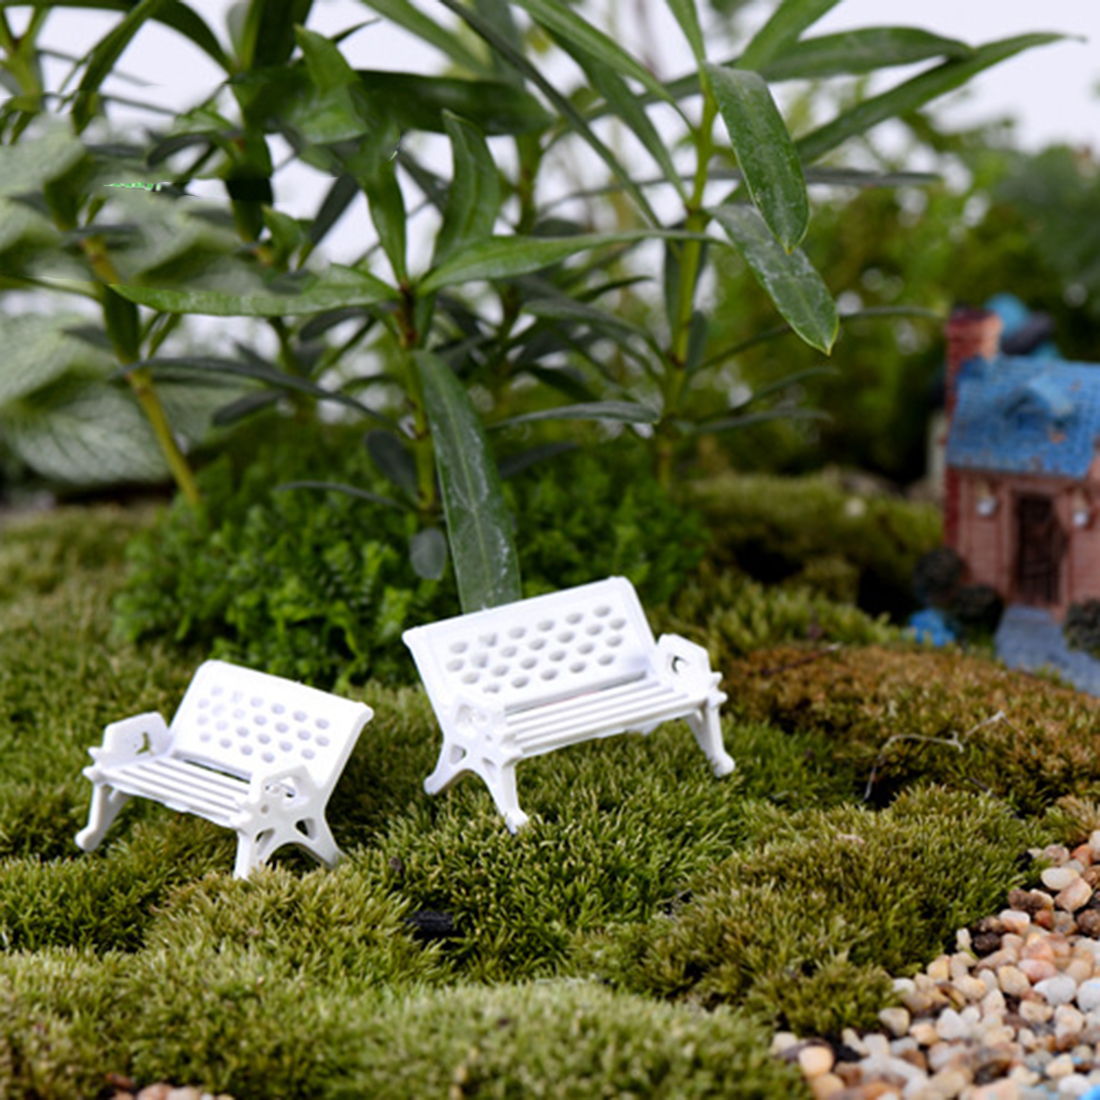 Big Sale 1Pcs Miniature White Chair Christmas Diy Plastics Fairy Garden Craft Decoration